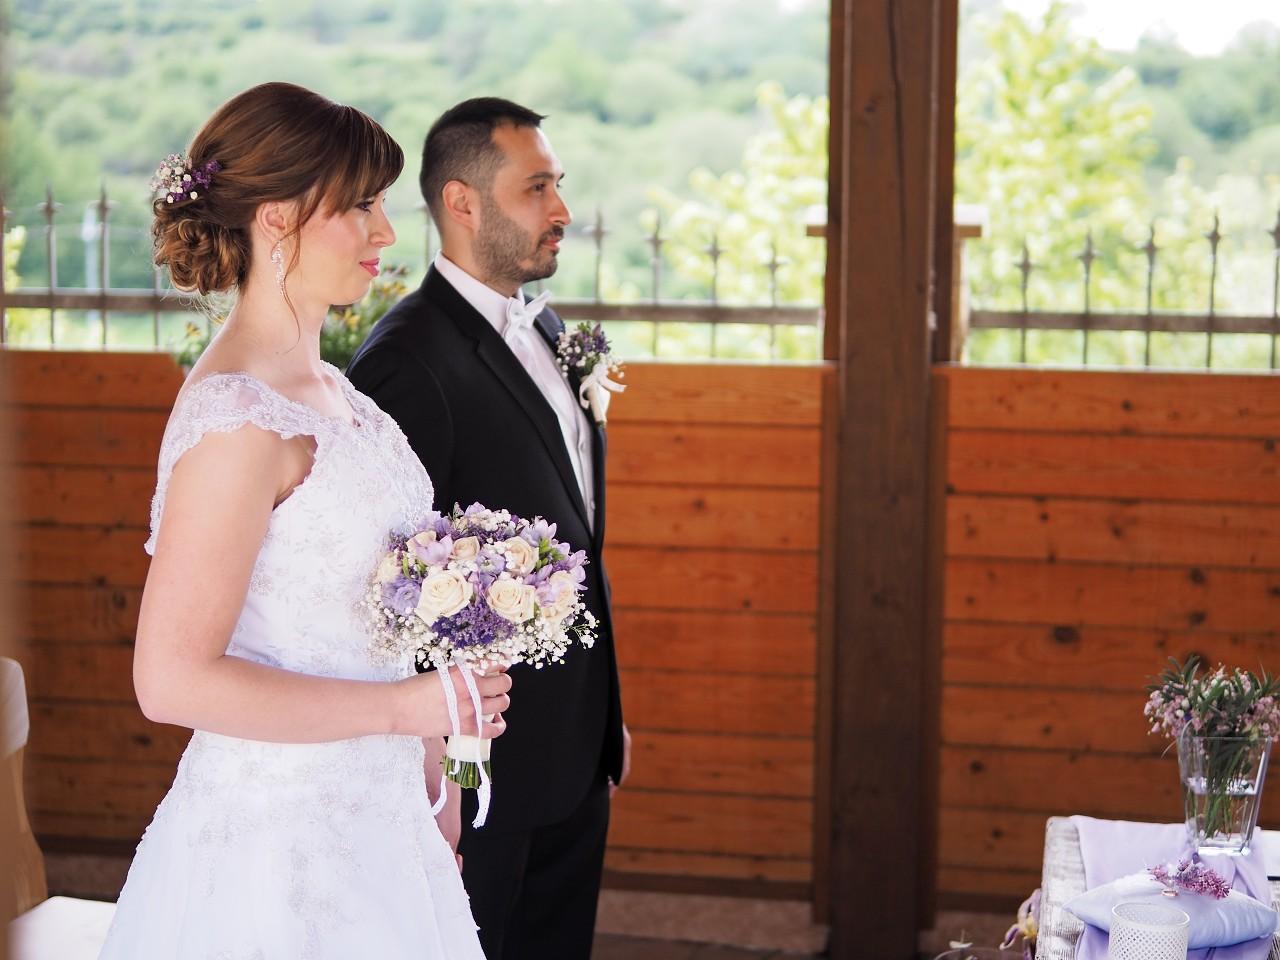 Svatba Michaely a Tibora na Skaláku - Obrázek č. 6